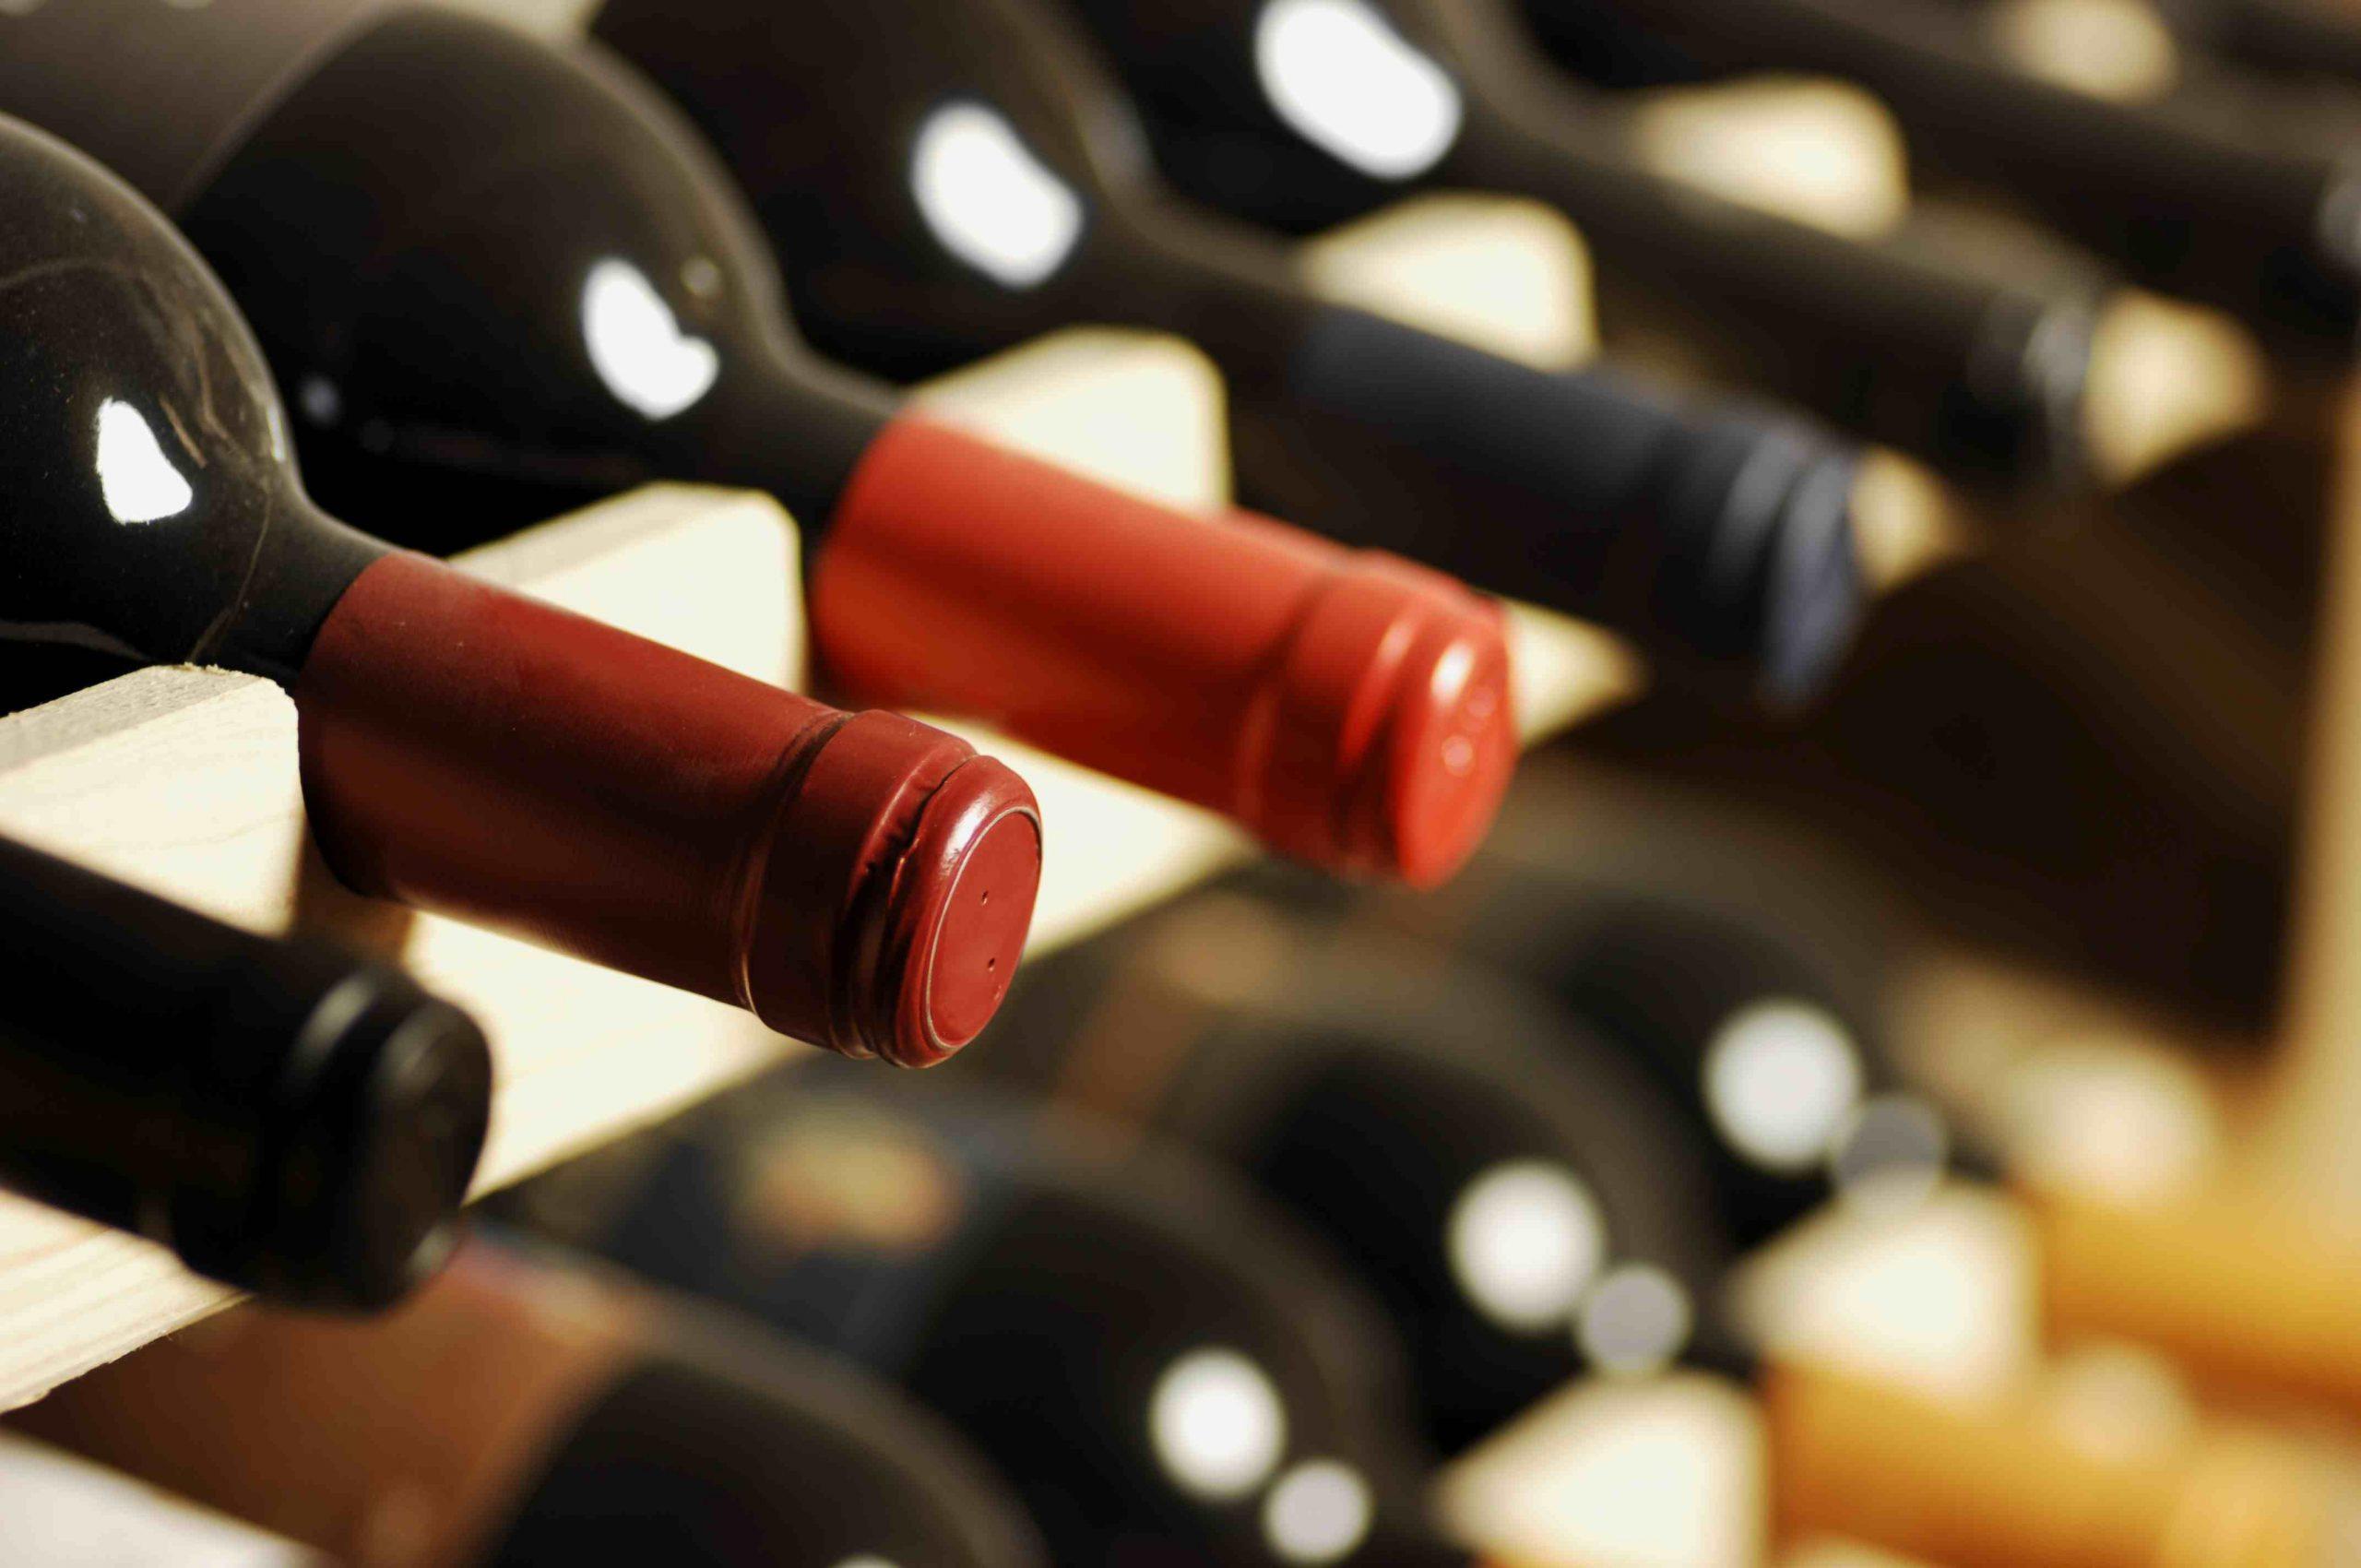 Kamloops region wineries expecting to see benefits under B.C VQA label